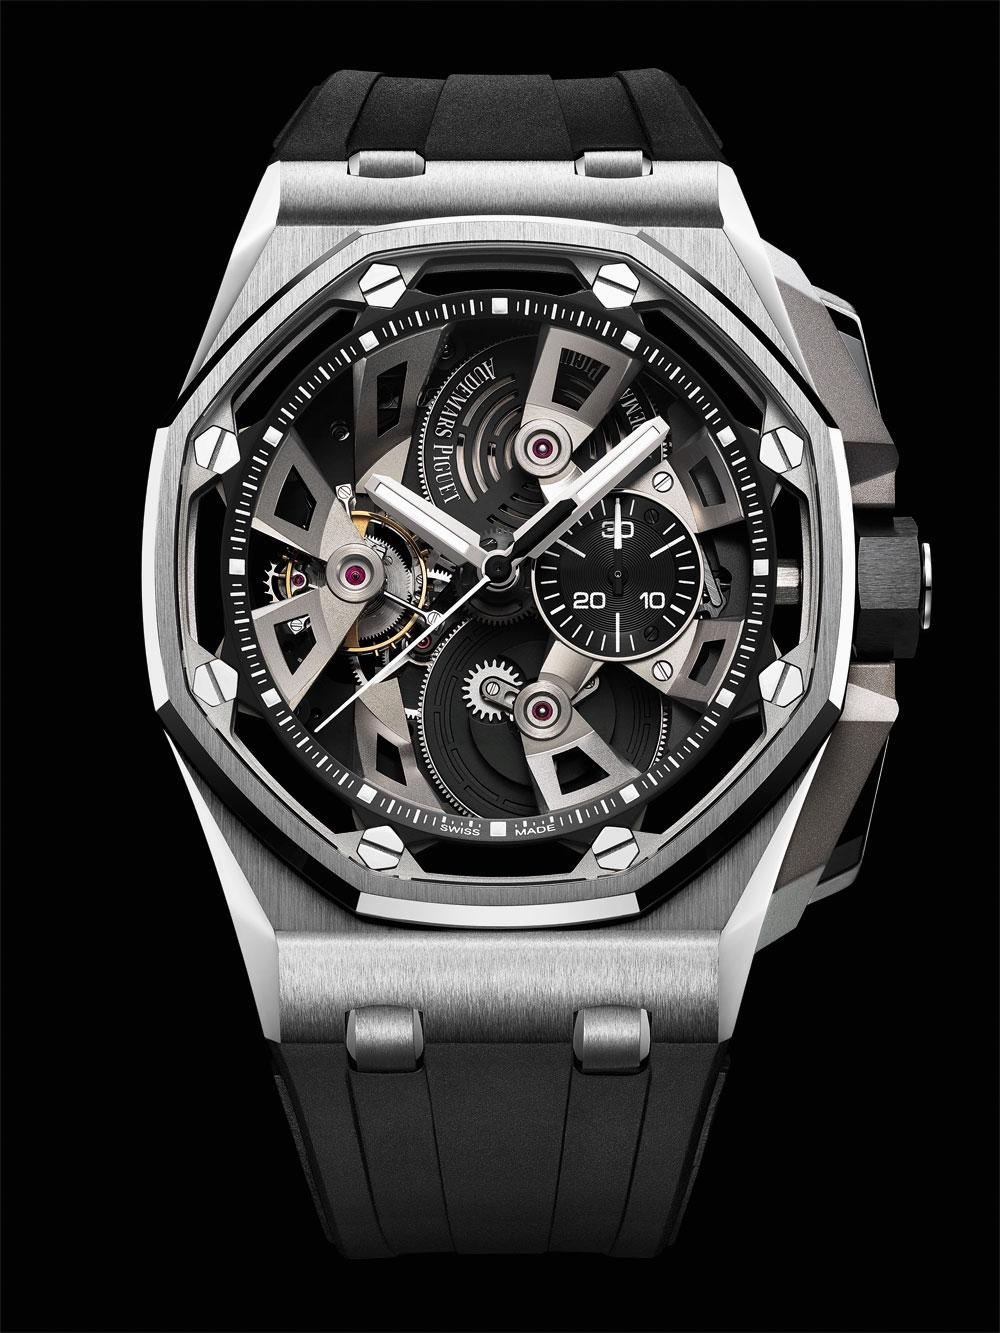 Reloj Audemars Piguet Reloj Audemars Piguet Royal Oak Offshore Tourbillon Chronograph acero